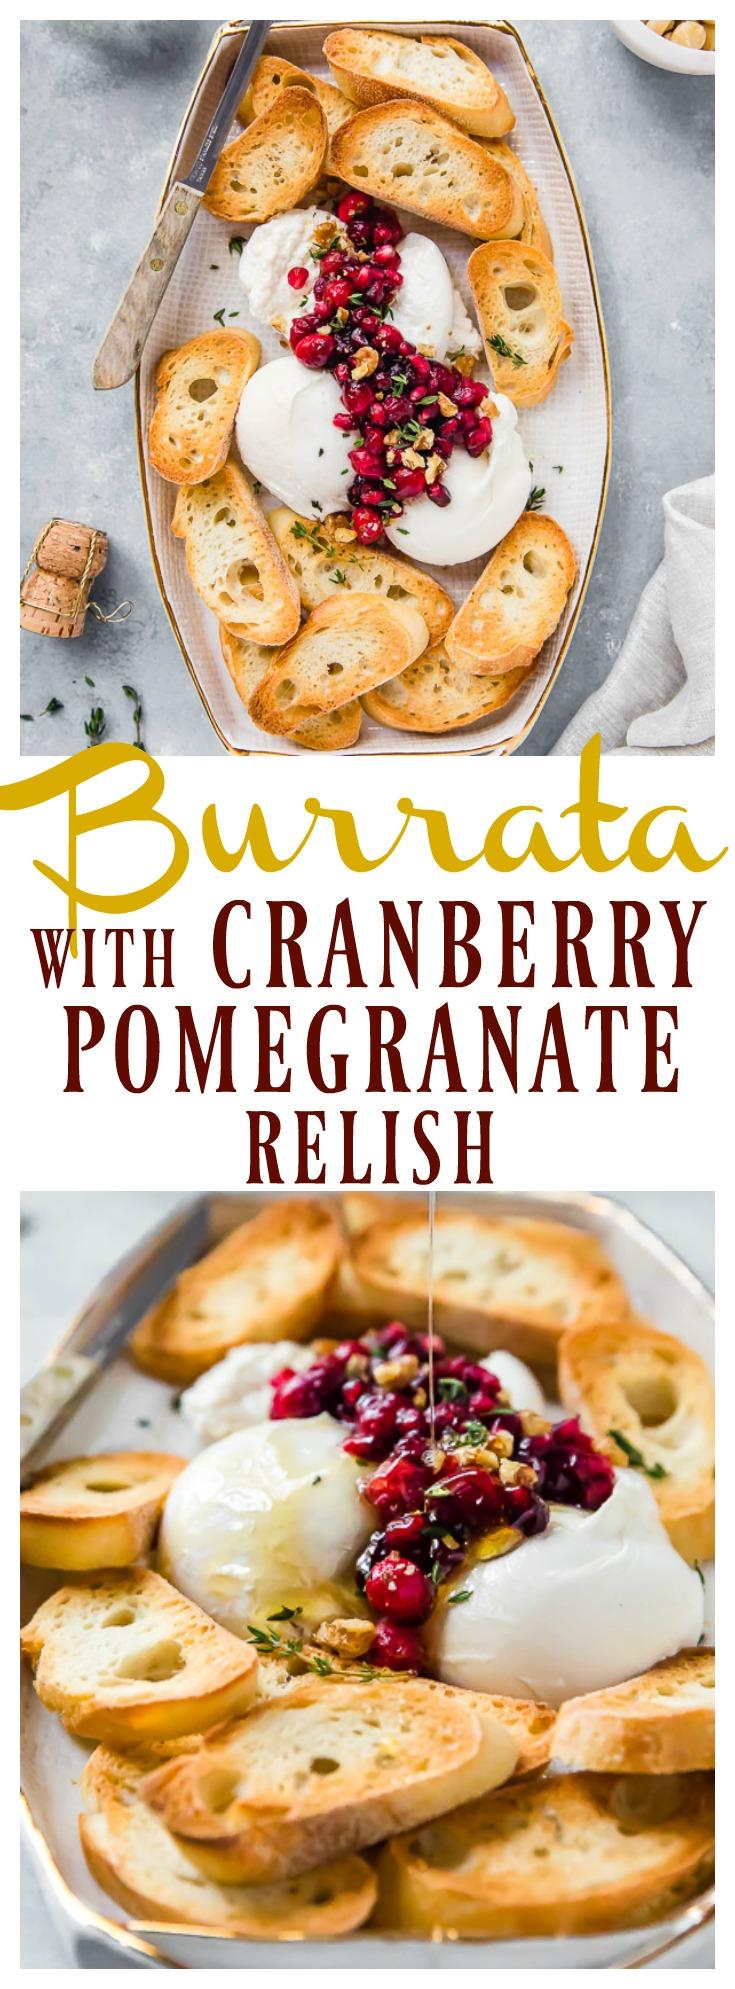 Burrata with Cranberry-Pomegranate Relish